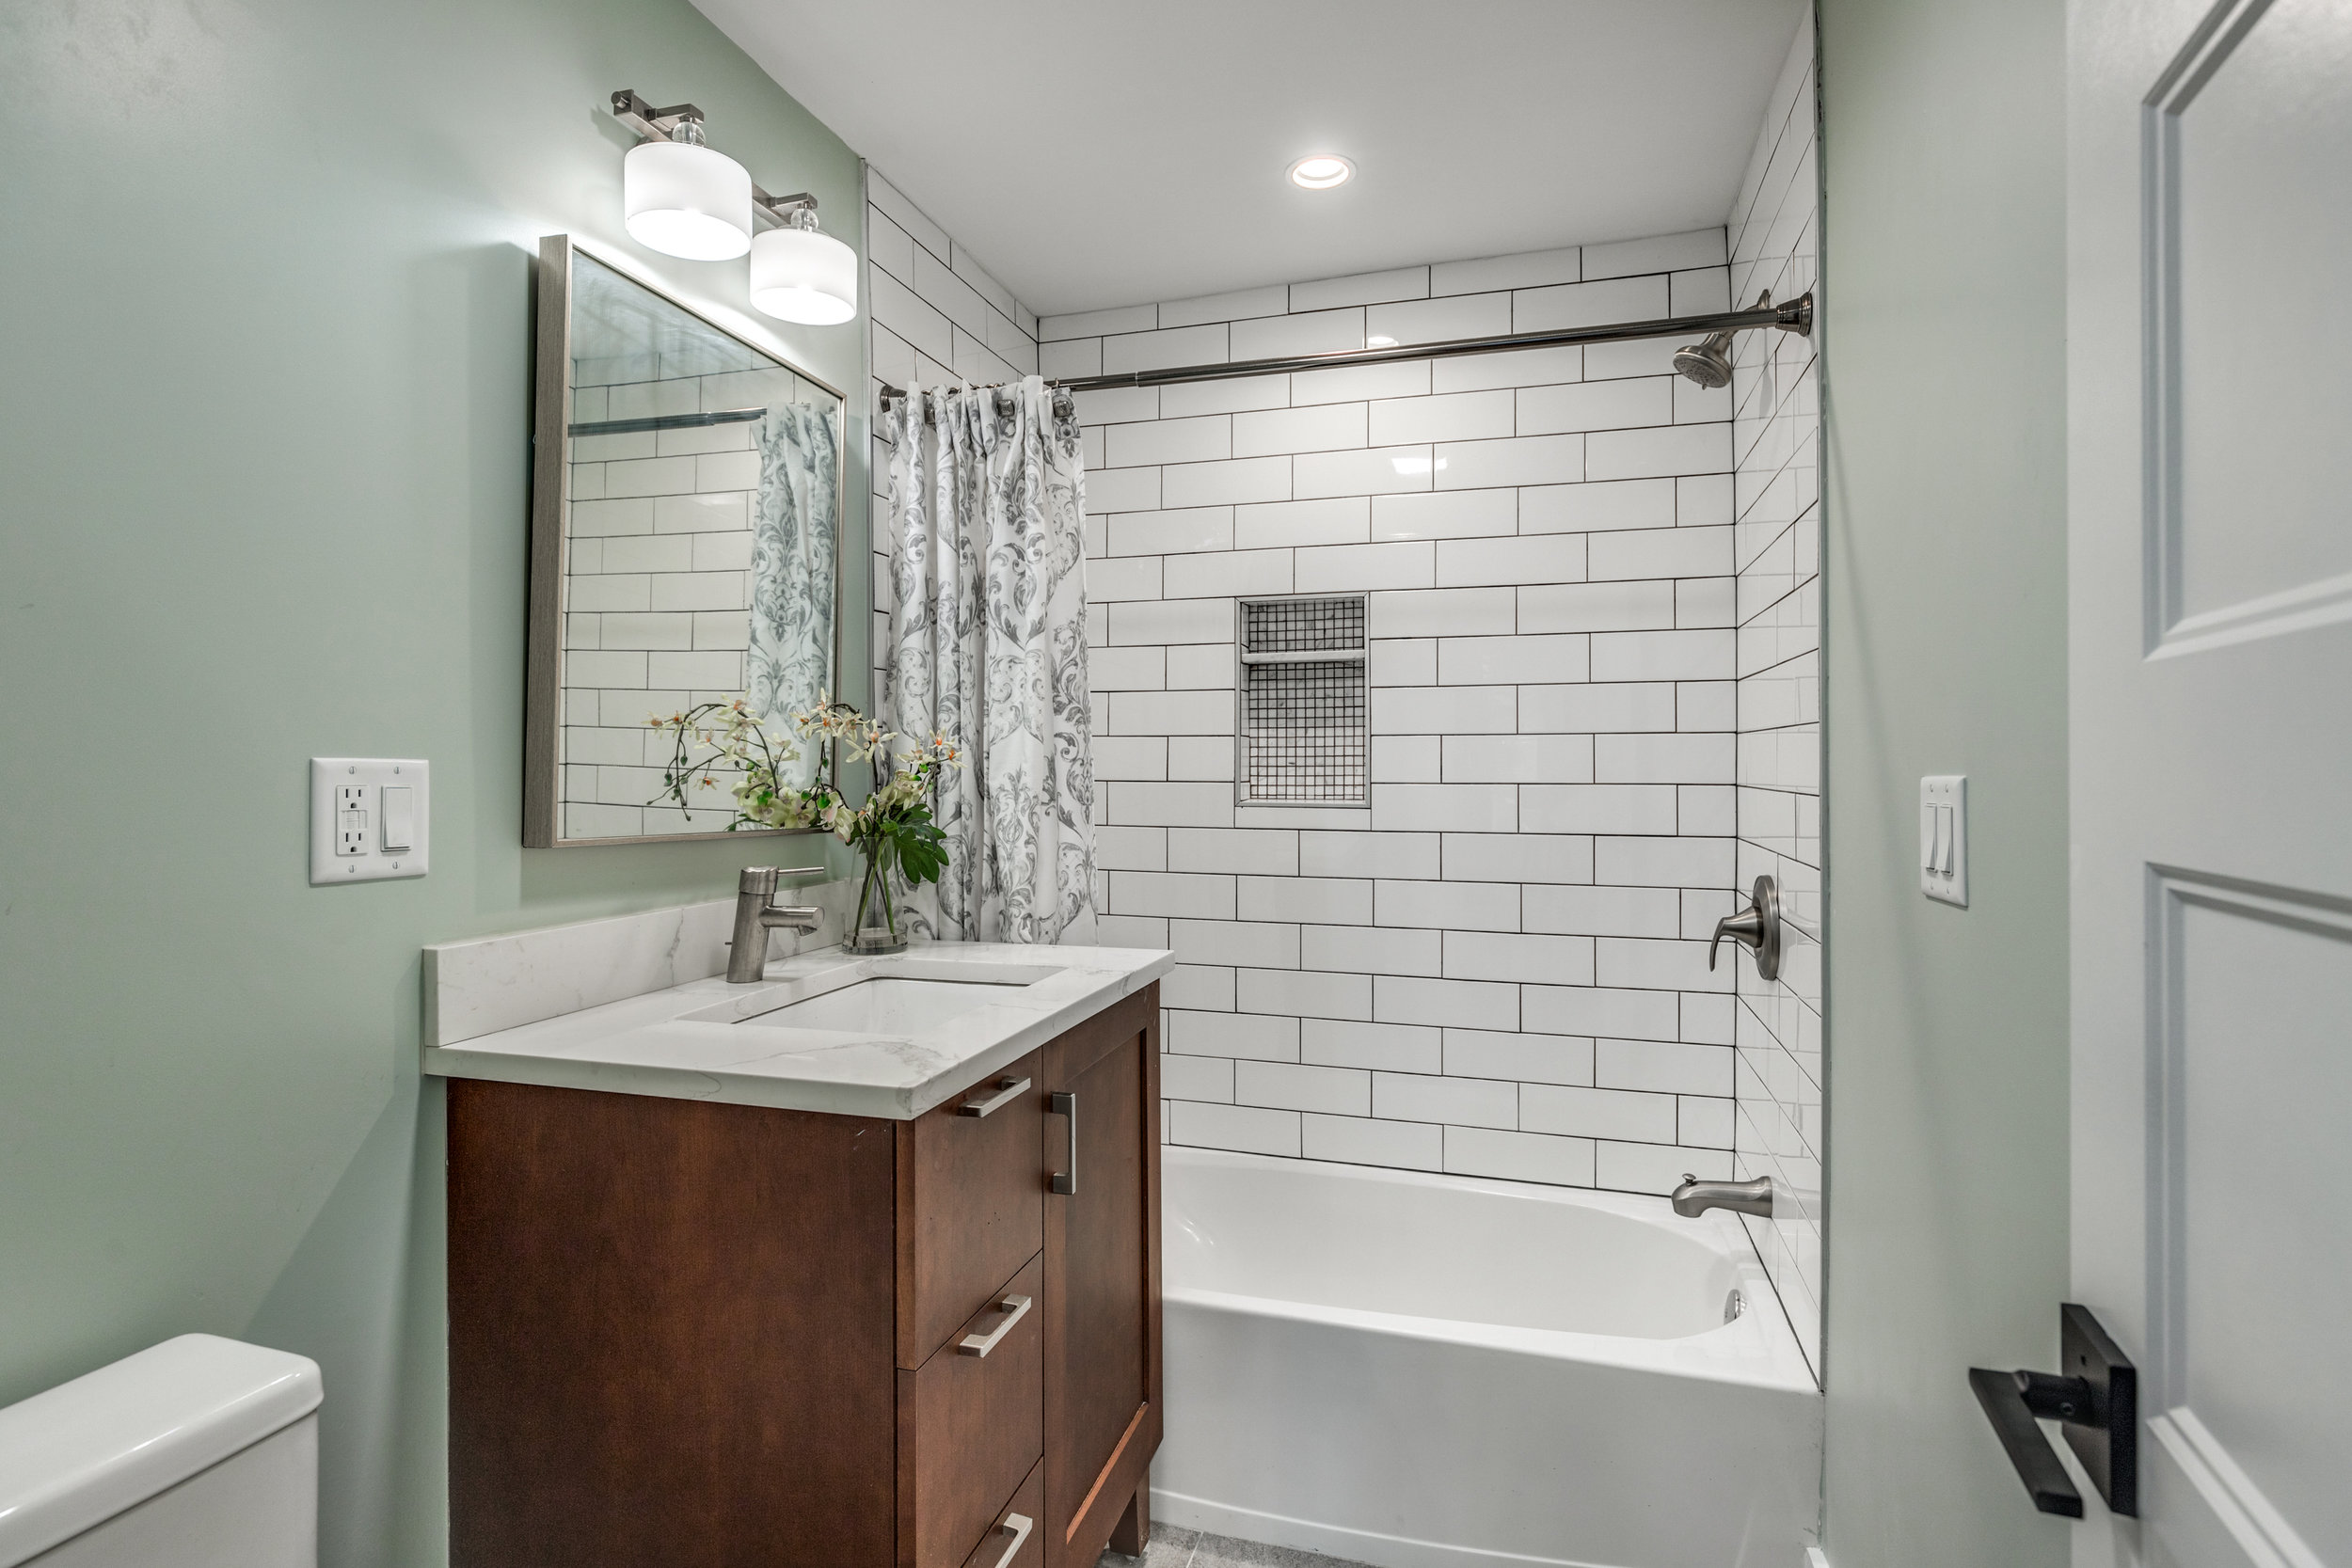 31_Bathroom-6.jpg